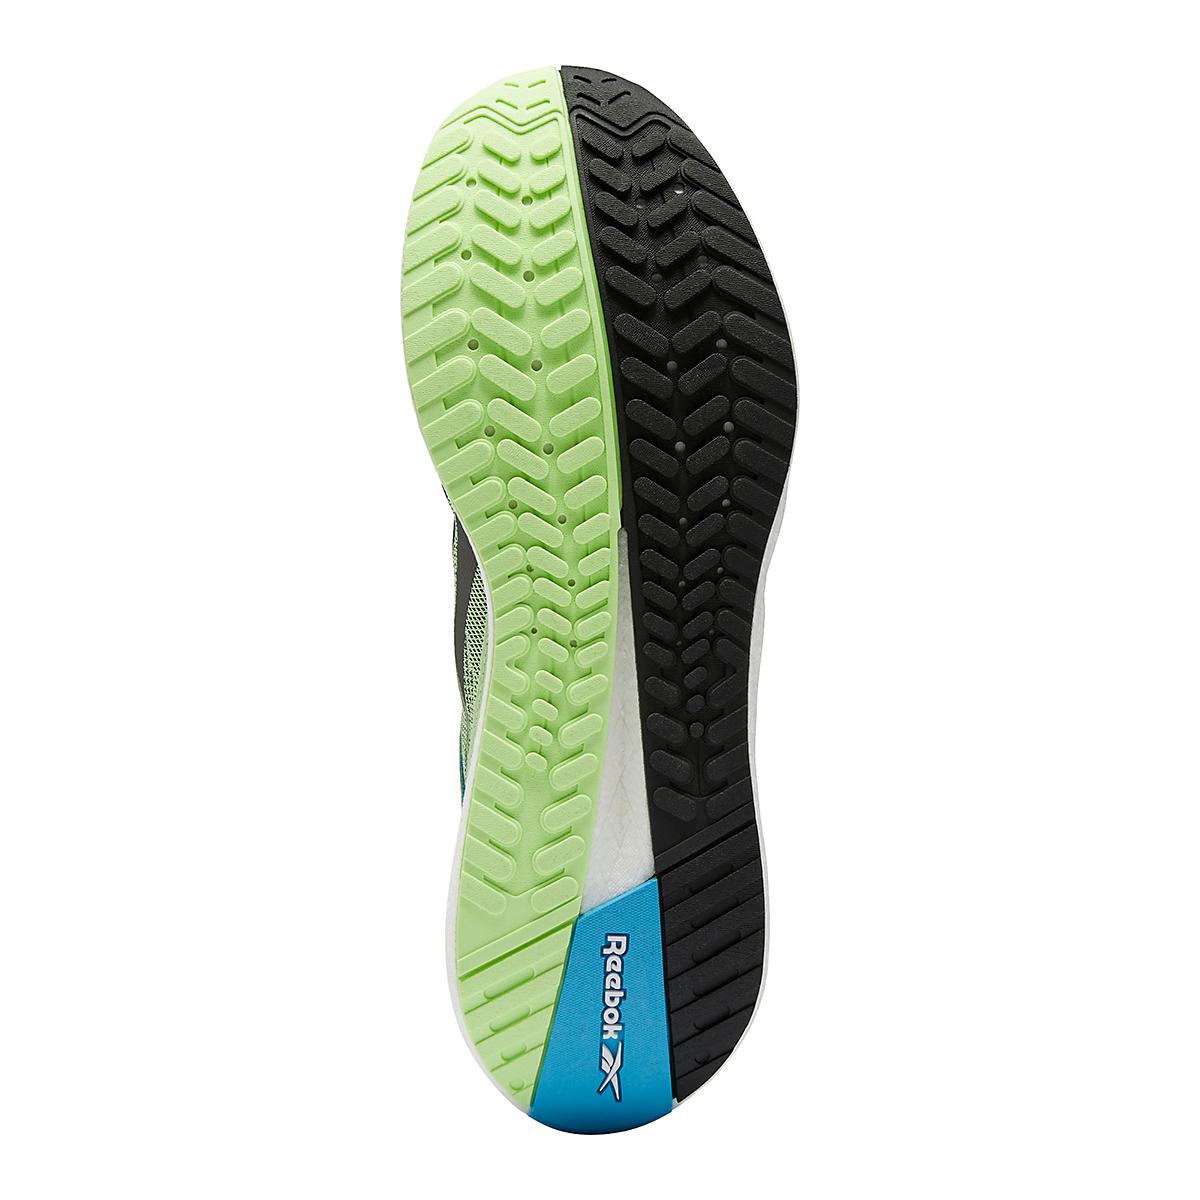 Men's Reebok Floatride Energy Symmetros Running Shoe - Color: Neon Mint/Core Black/White - Size: 7 - Width: Regular, Neon Mint/Core Black/White, large, image 3